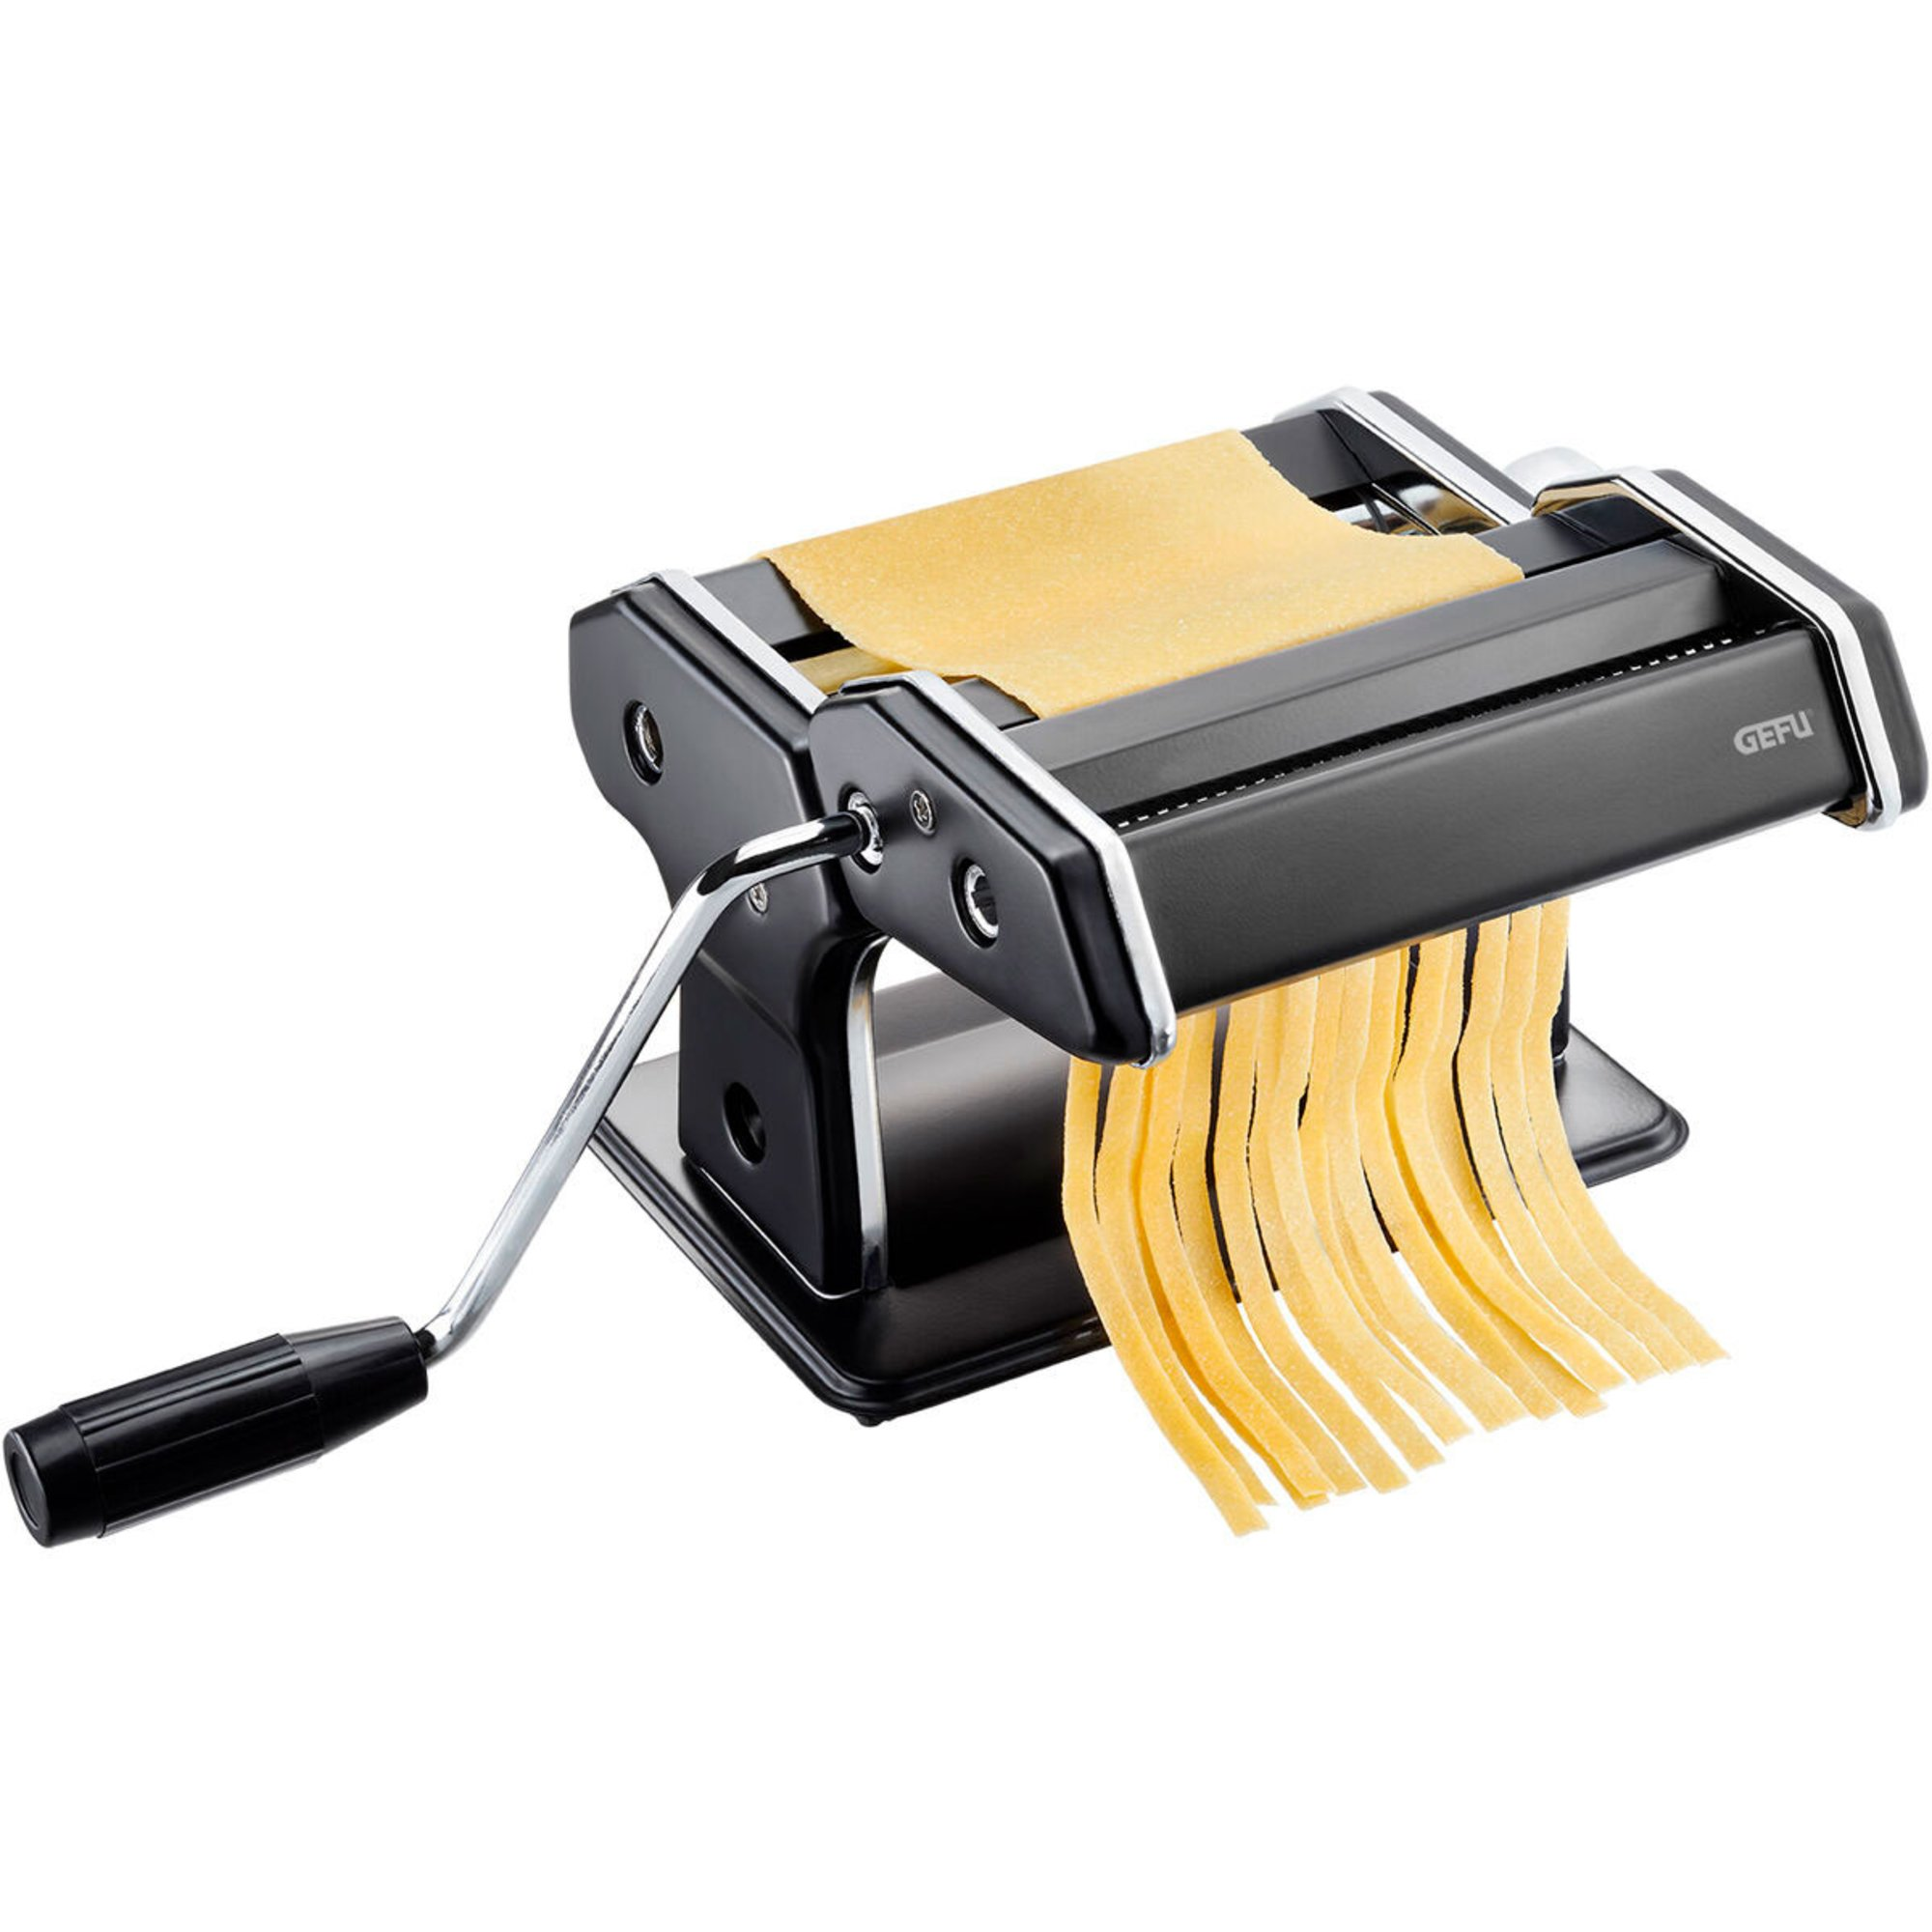 GEFU Perfetta pastamaskin svart